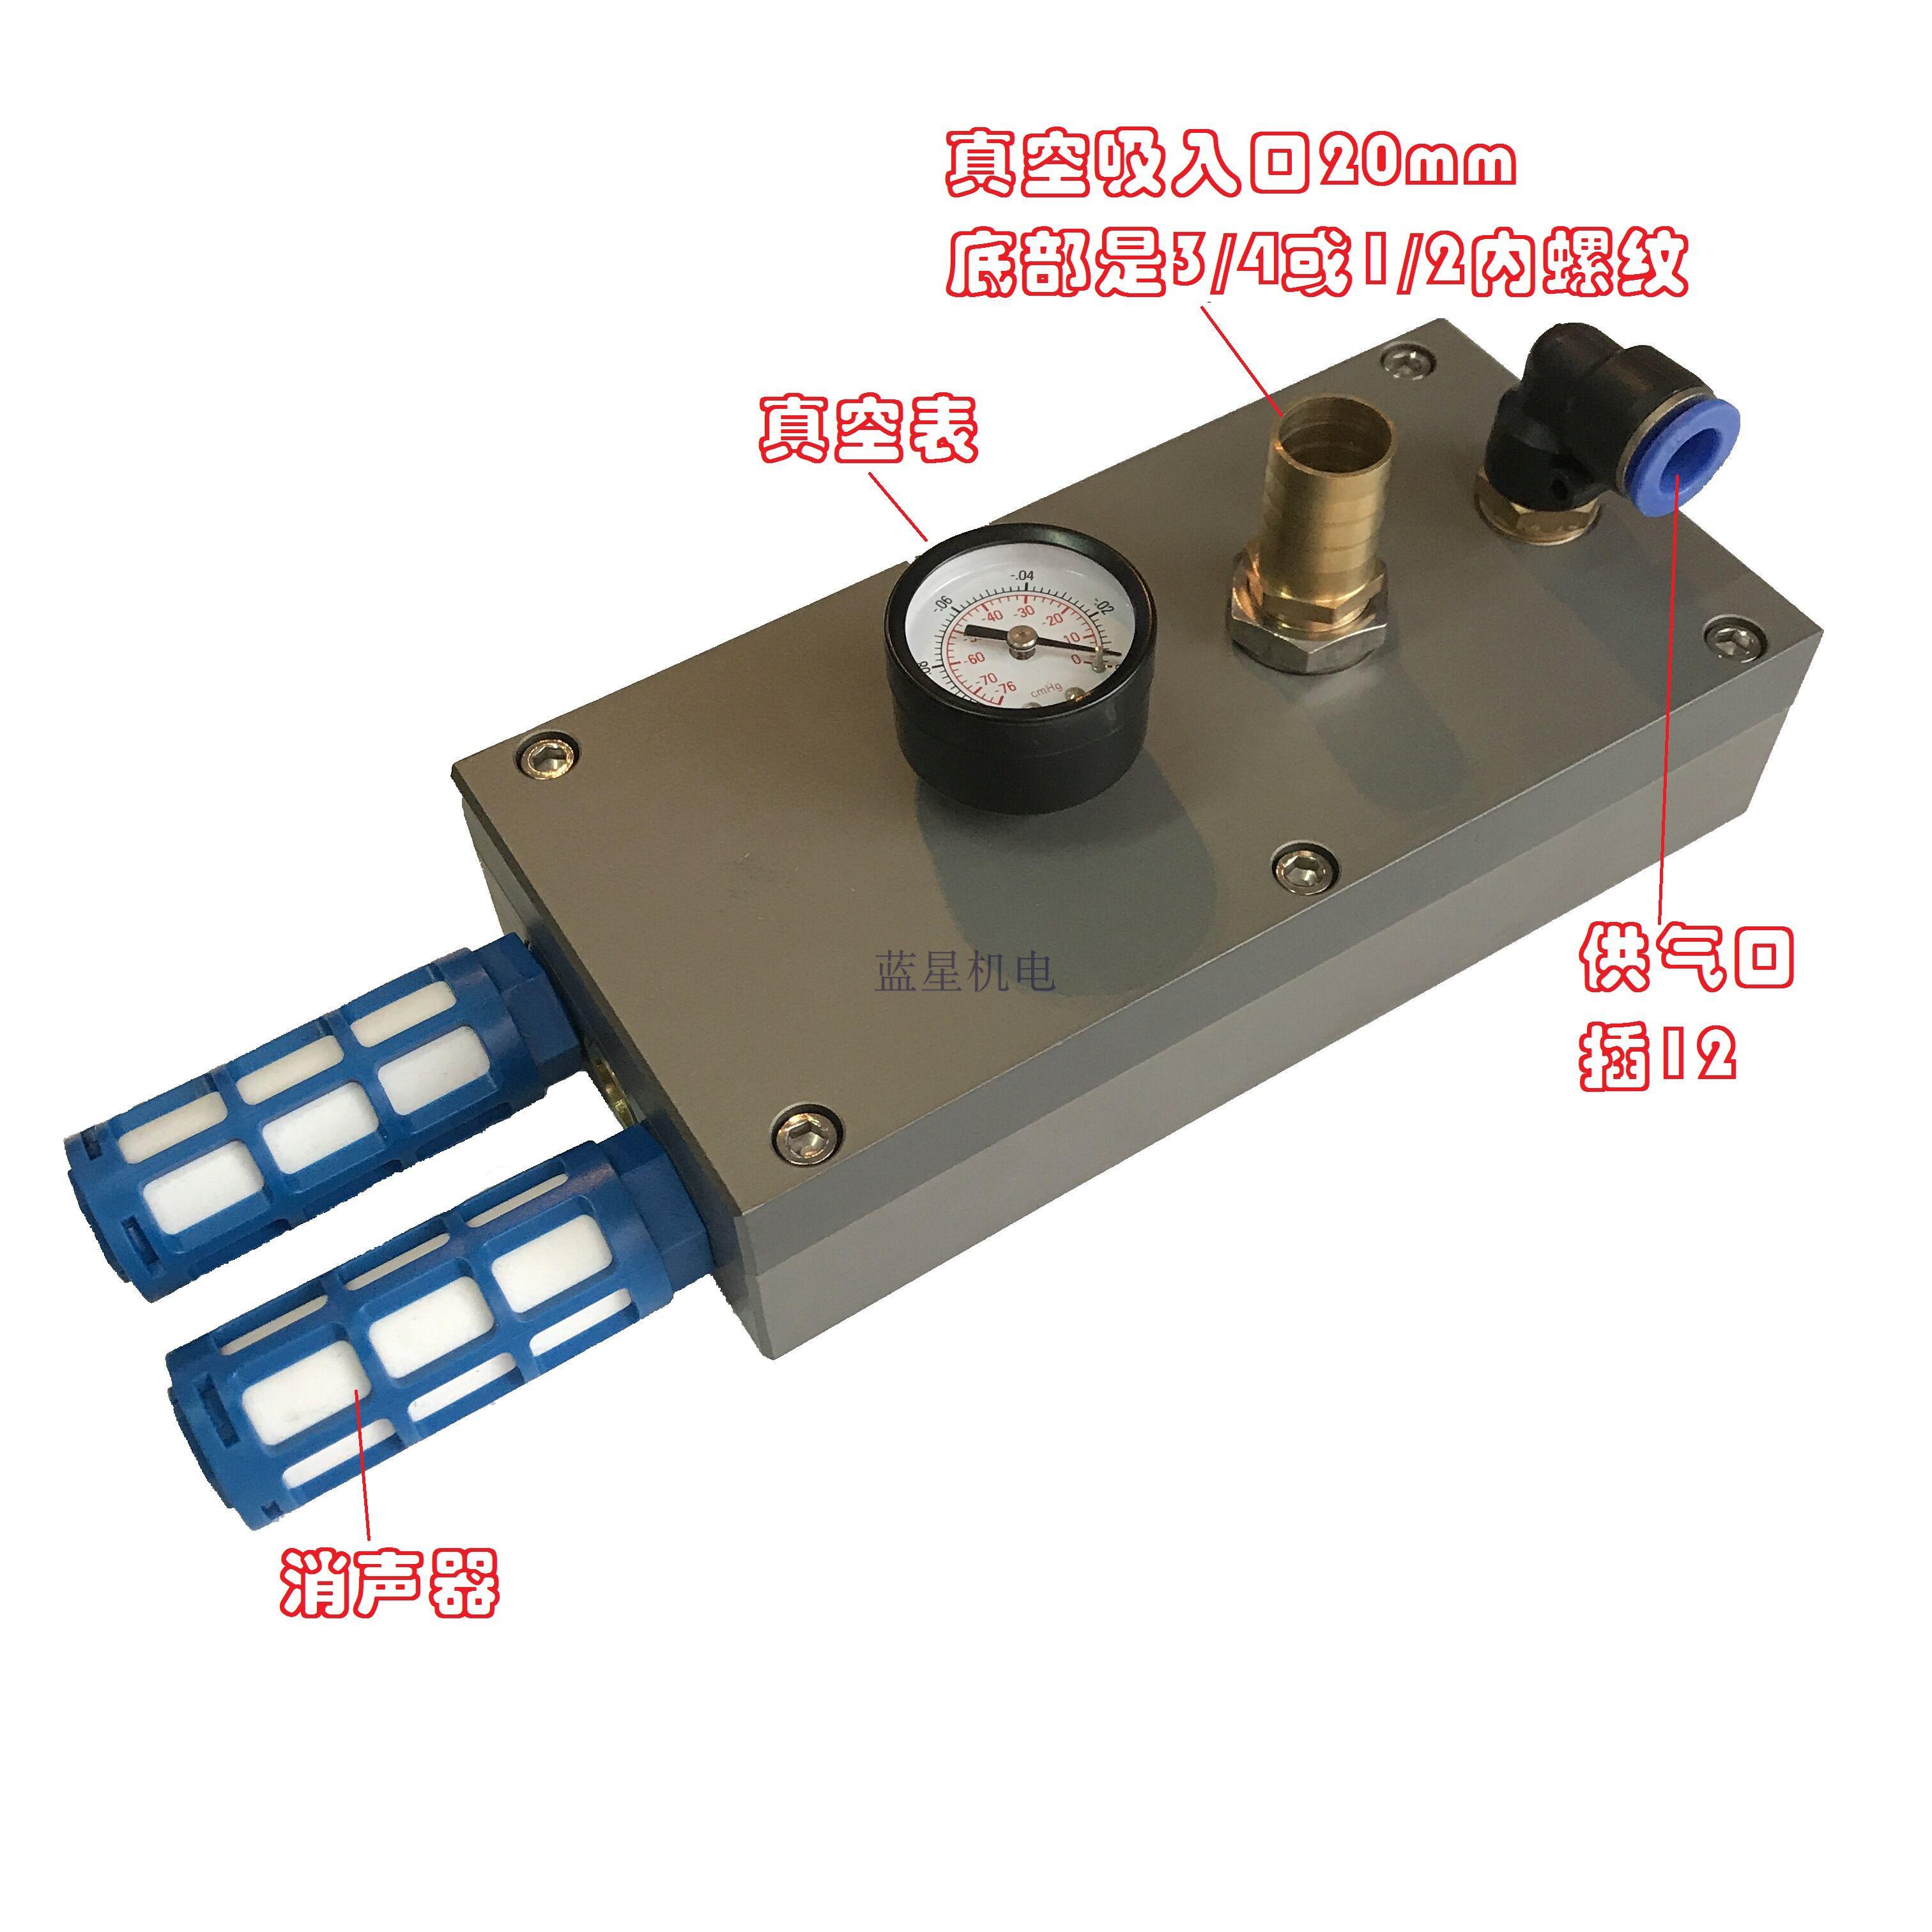 цена на Large flow vacuum generator VTM700-06 flow 700L diameter 3/4) KV800-90 VTM750-80